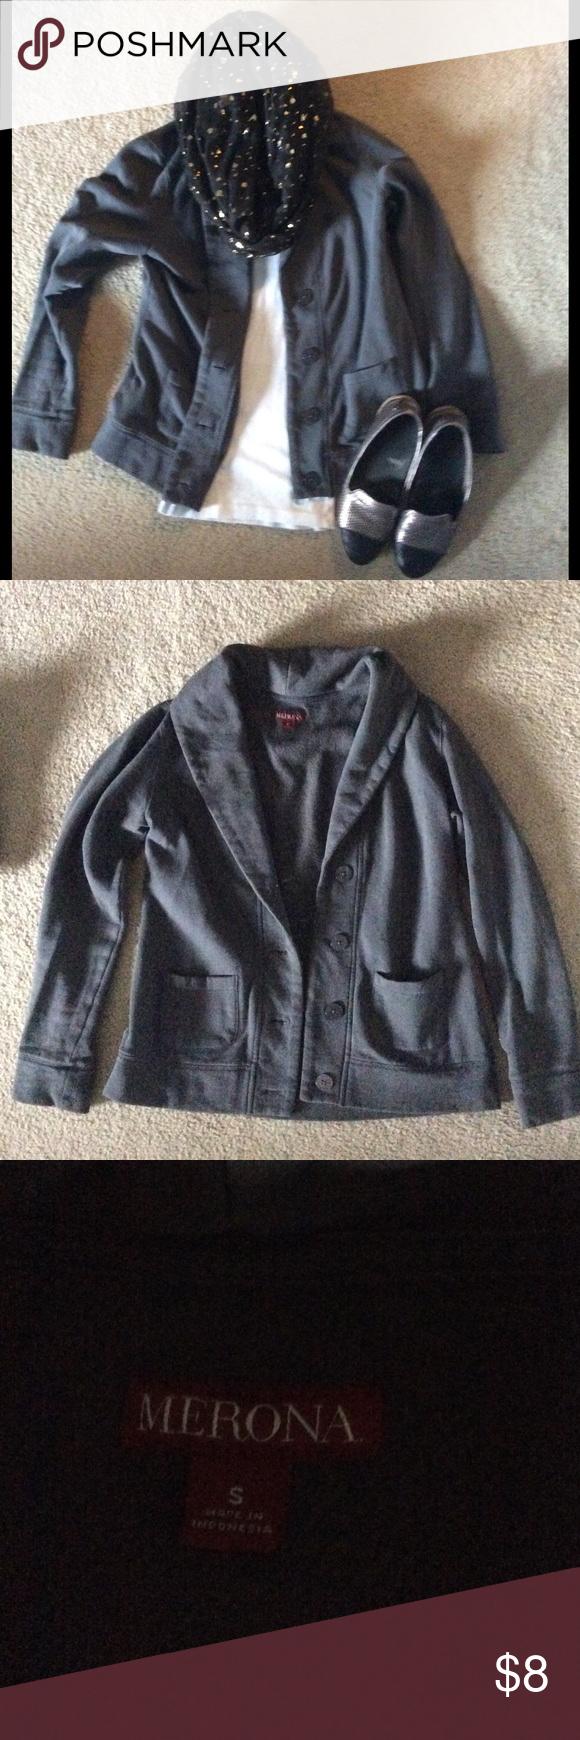 MERONA Sweater Blazer Stylish like a blazer, but comfy like a sweater! This gray jacket has four buttons and two pockets. Merona Jackets & Coats Blazers